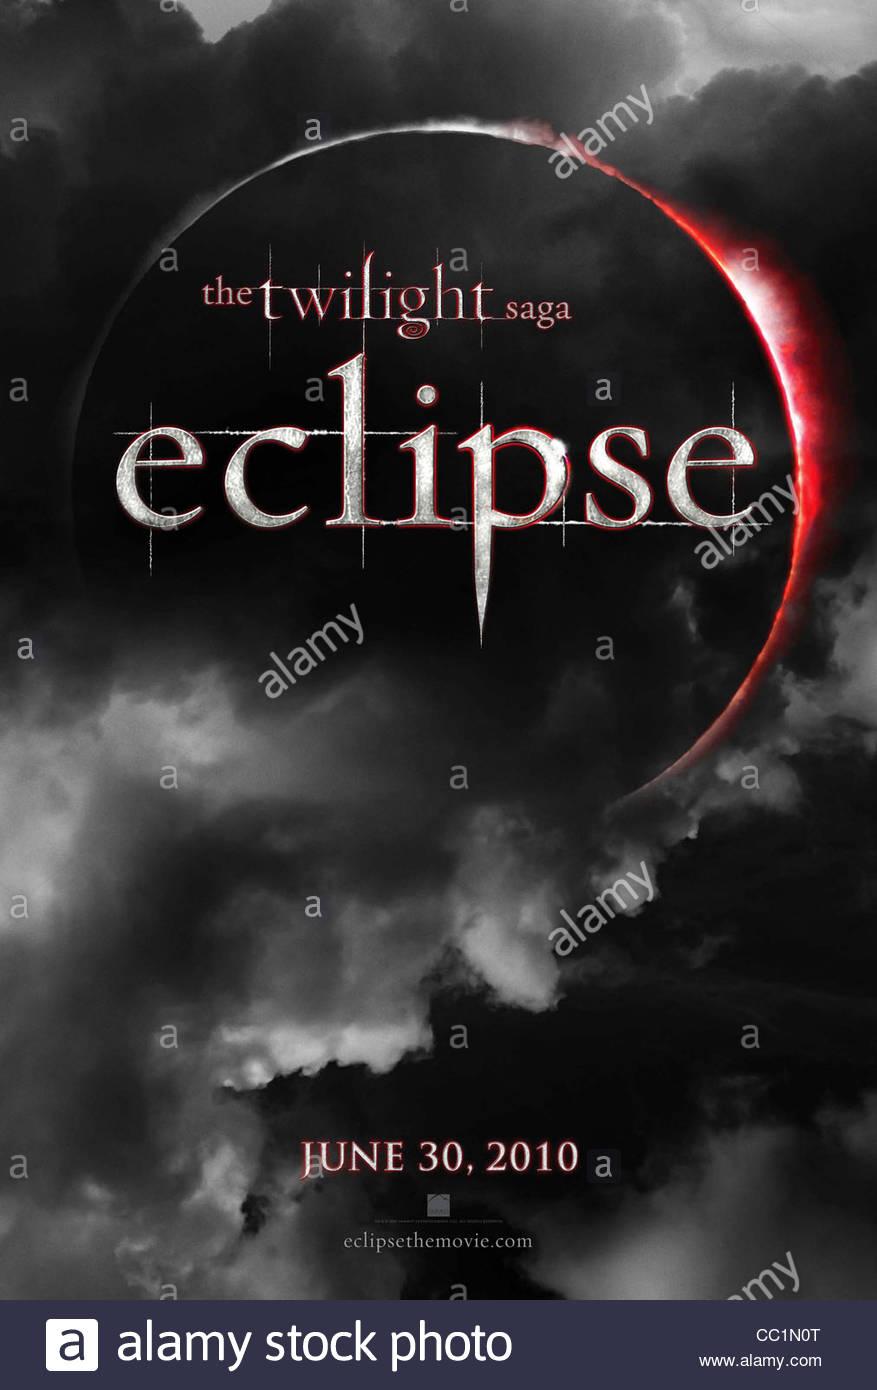 MOVIE POSTER THE TWILIGHT SAGA: ECLIPSE (2010) - Stock Image